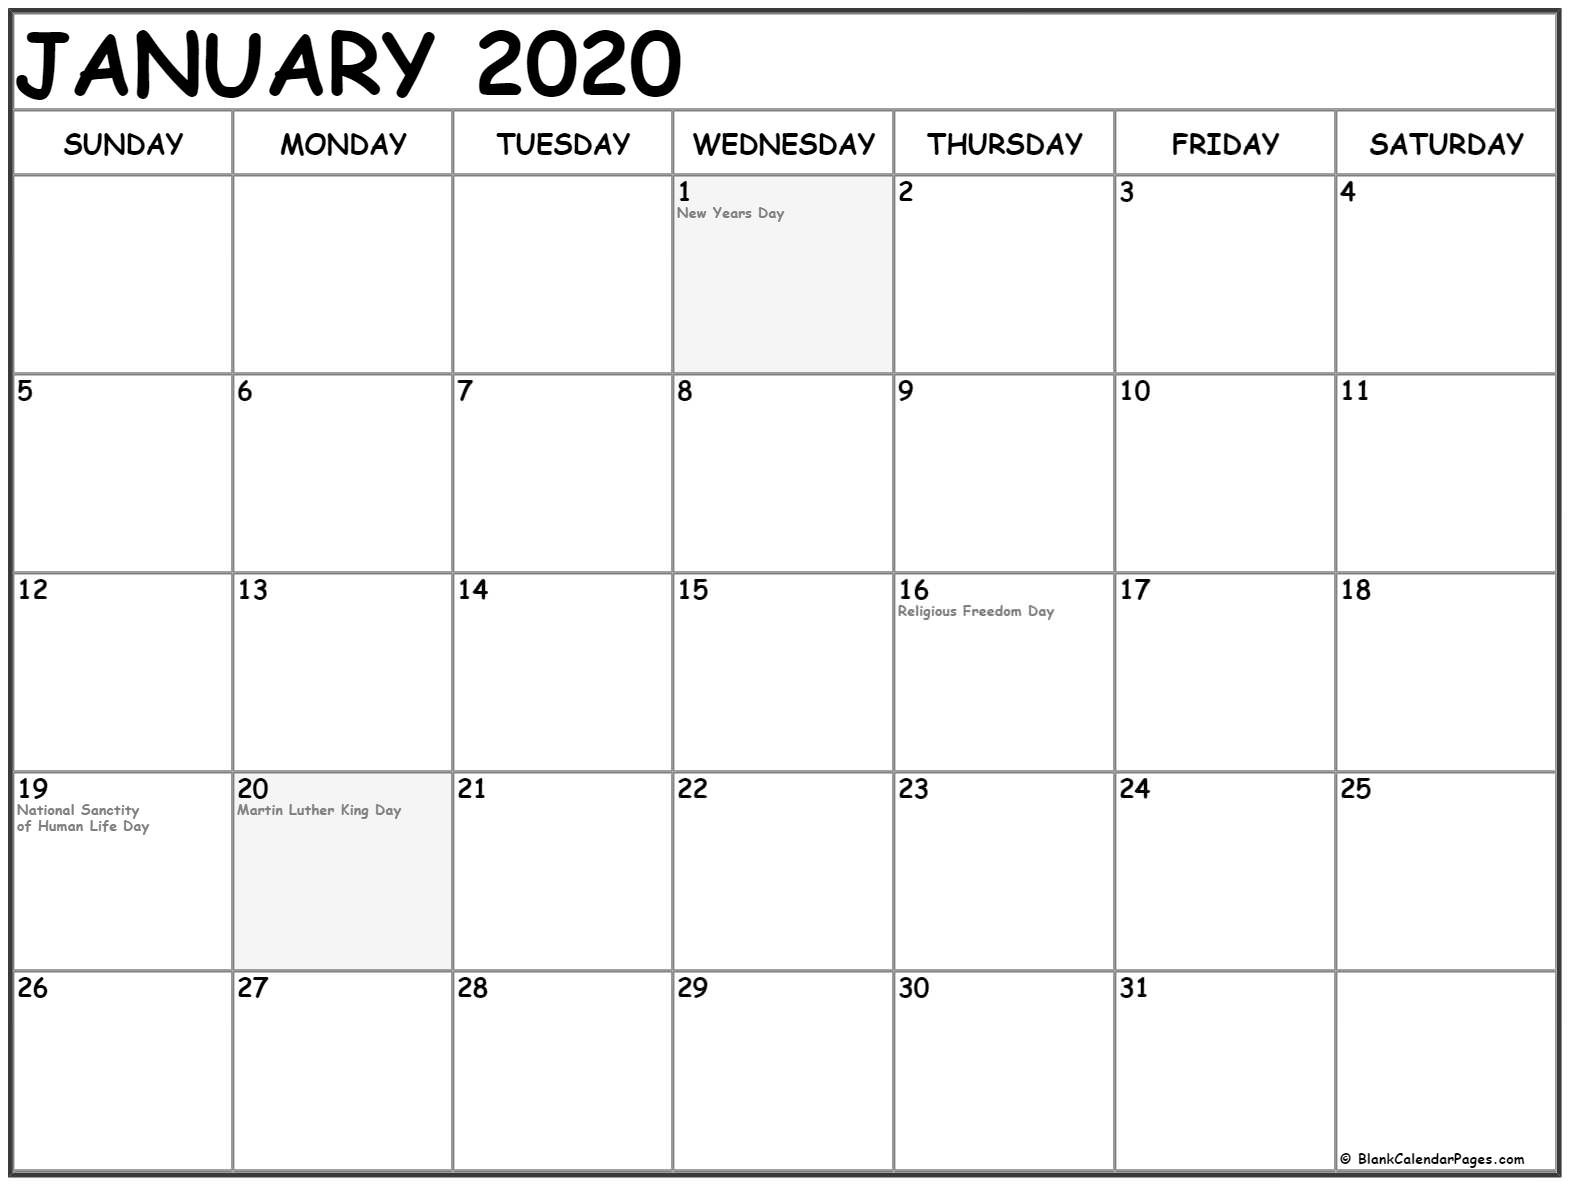 January 2020 Calendar Printable Templates Holidays - July-January 2020 Calendar With Us Holidays